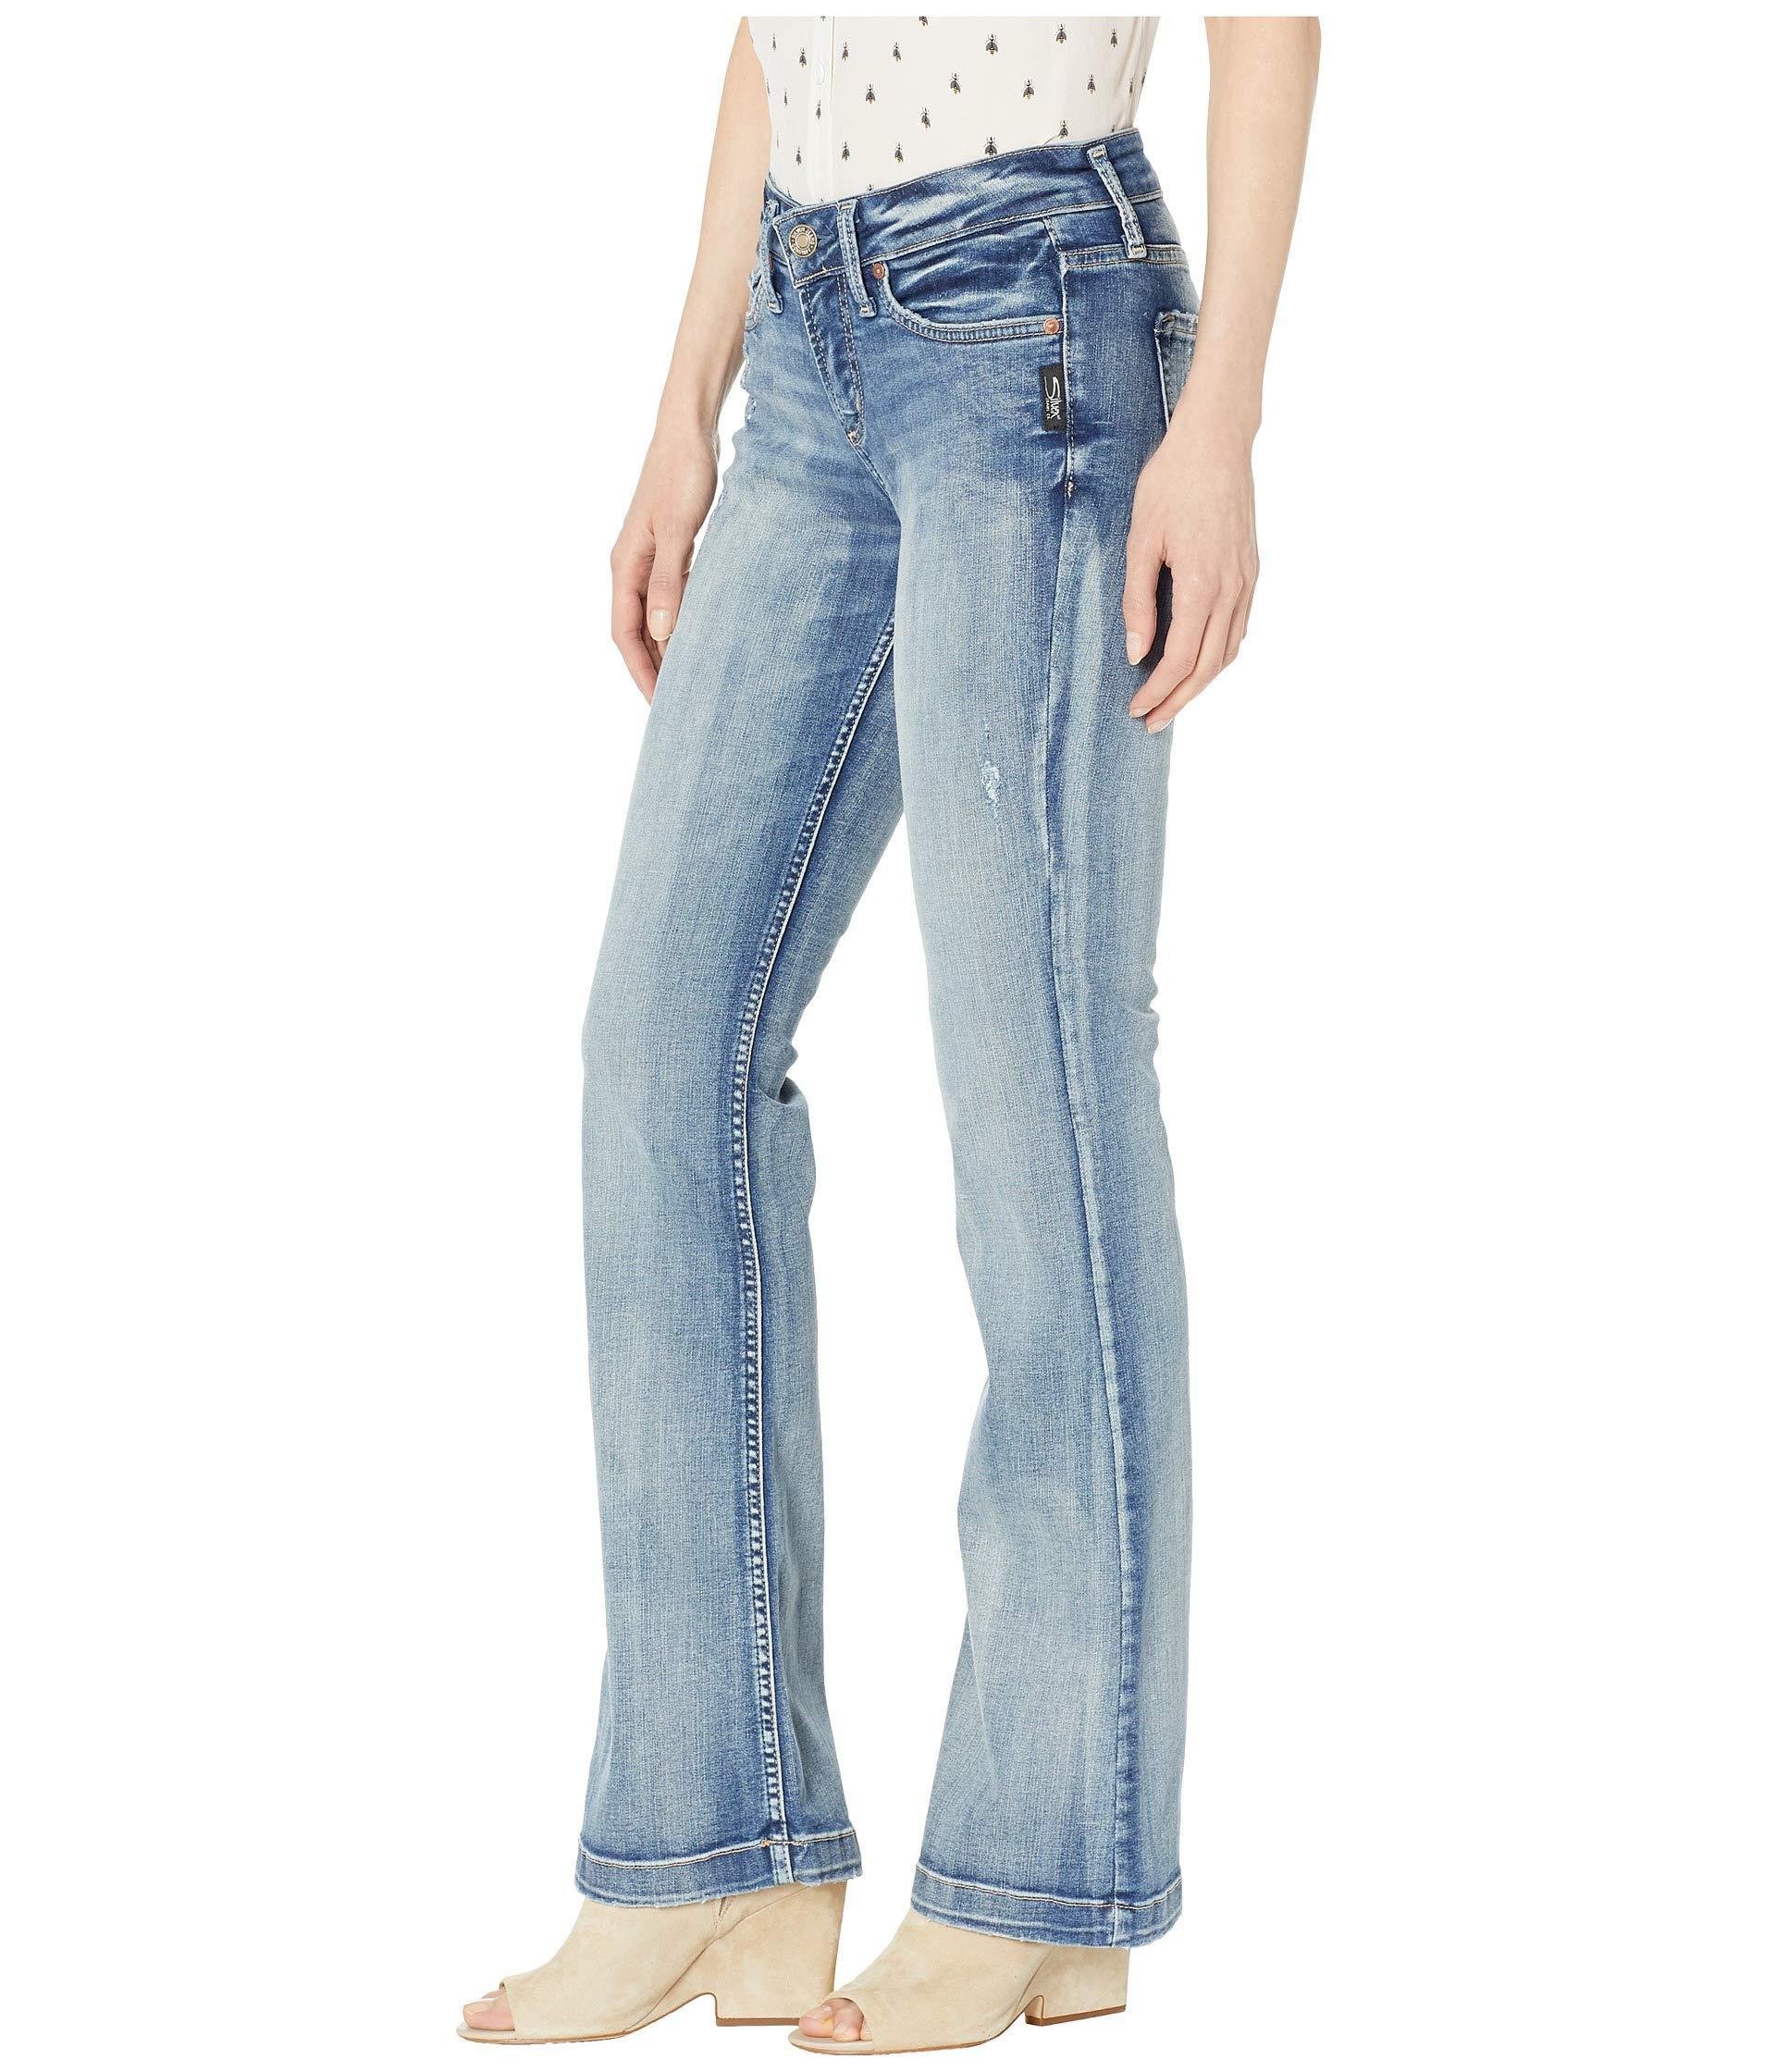 608eba0ebcd Lyst - Silver Jeans Co. Suki Mid-rise Curvy Fit Bootcut Jeans In Indigo ( indigo) Women's Jeans in Blue